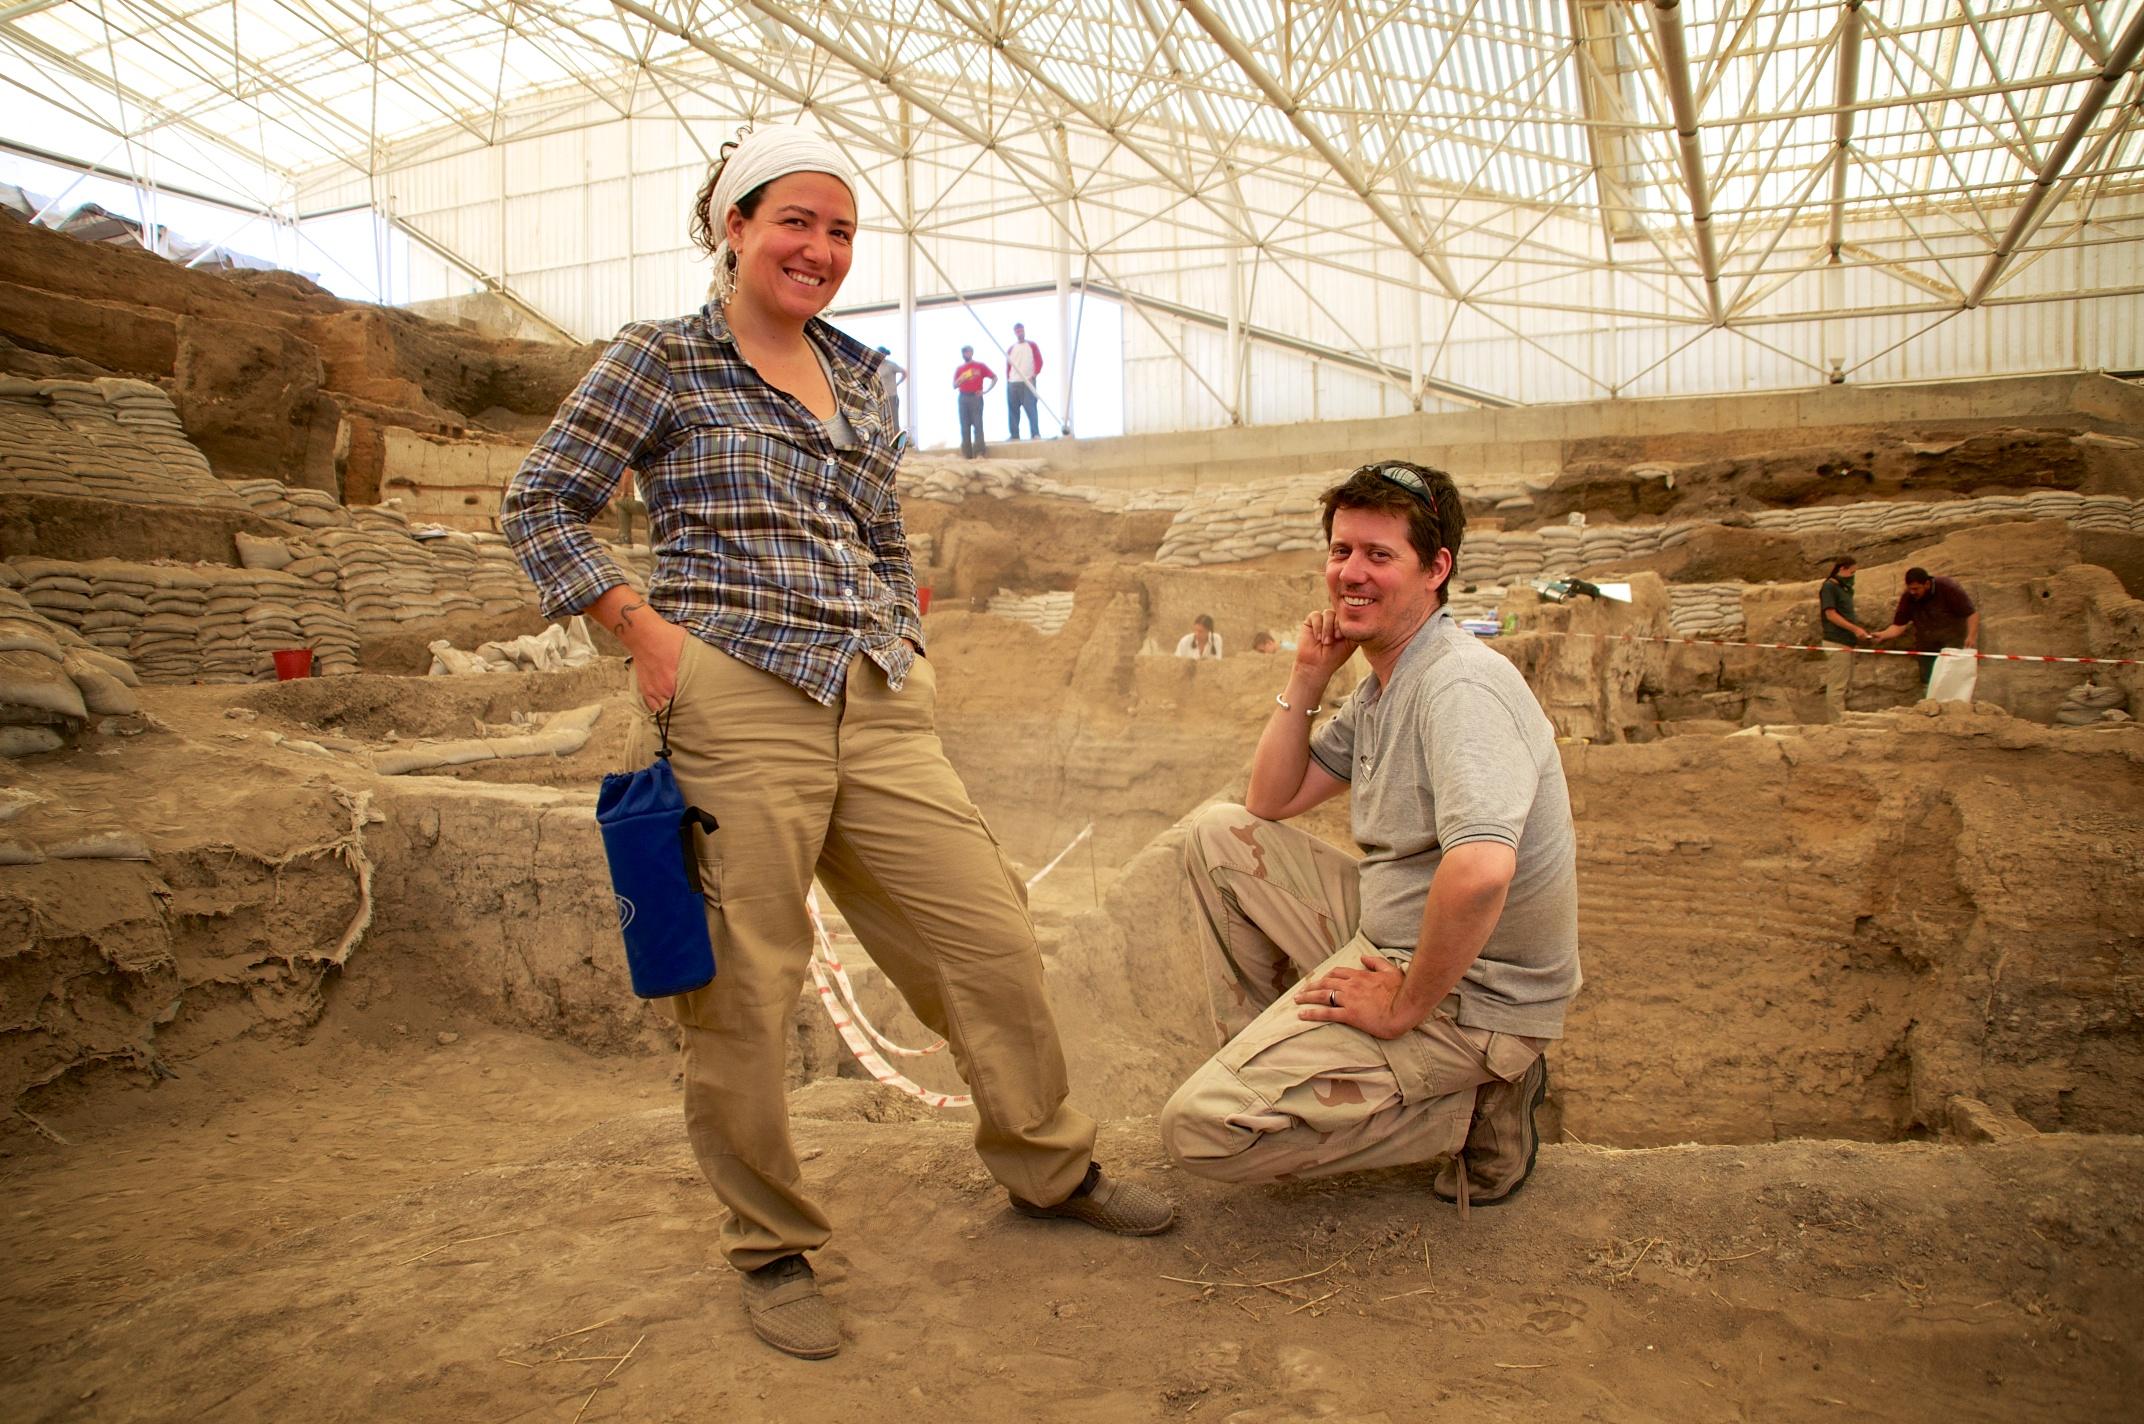 Burcu Tung and James Stuart, excavation directors at Çatalhöyük, gear up for the 2013 season.